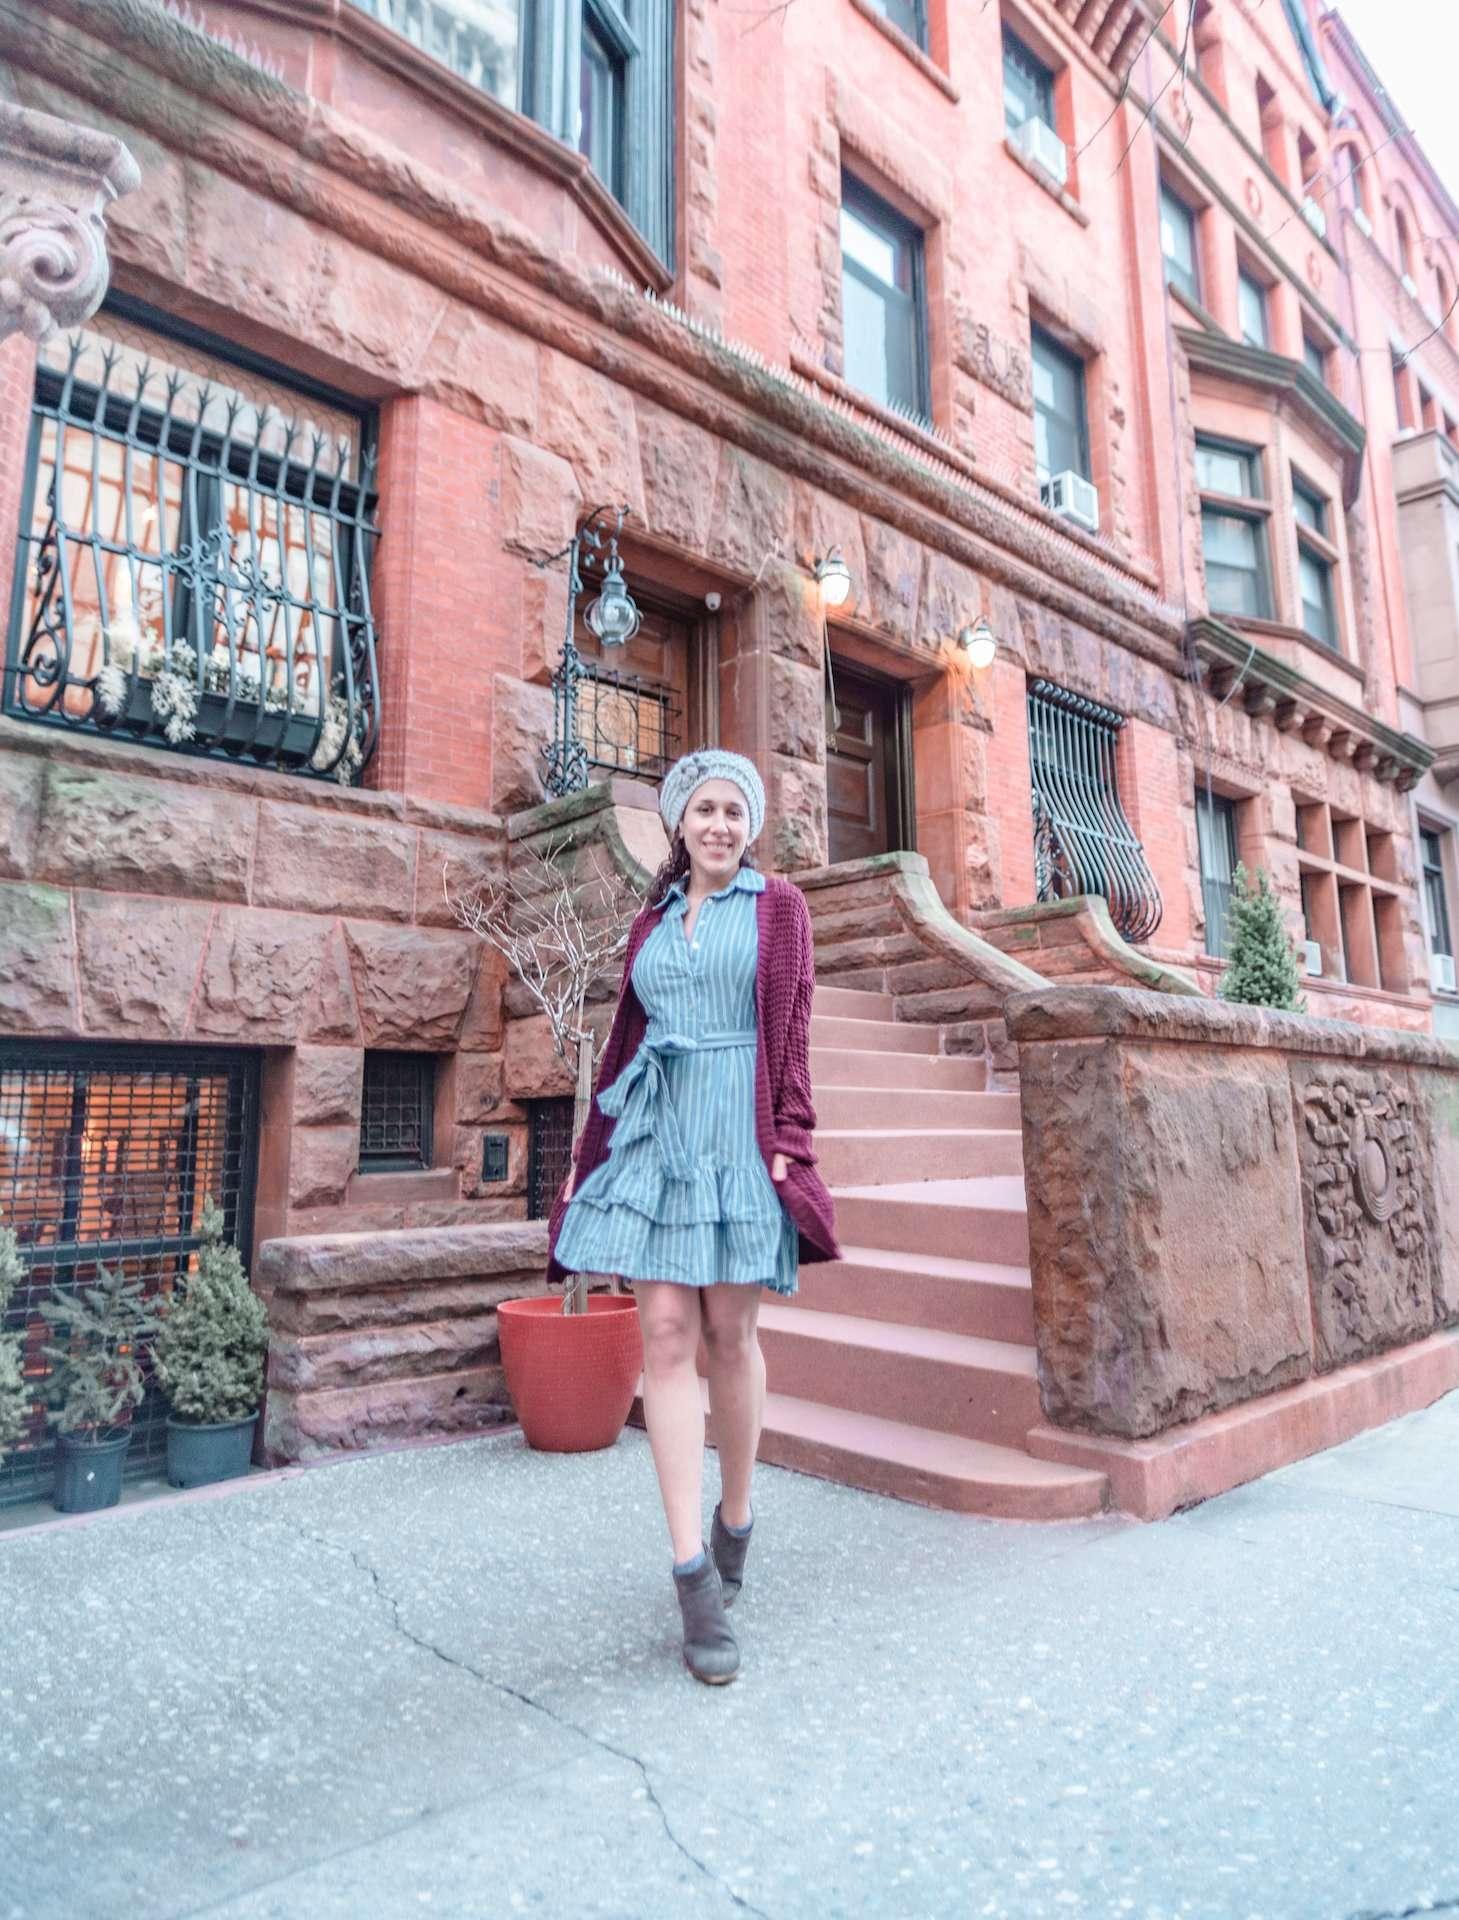 Brownstones on West 71st Street